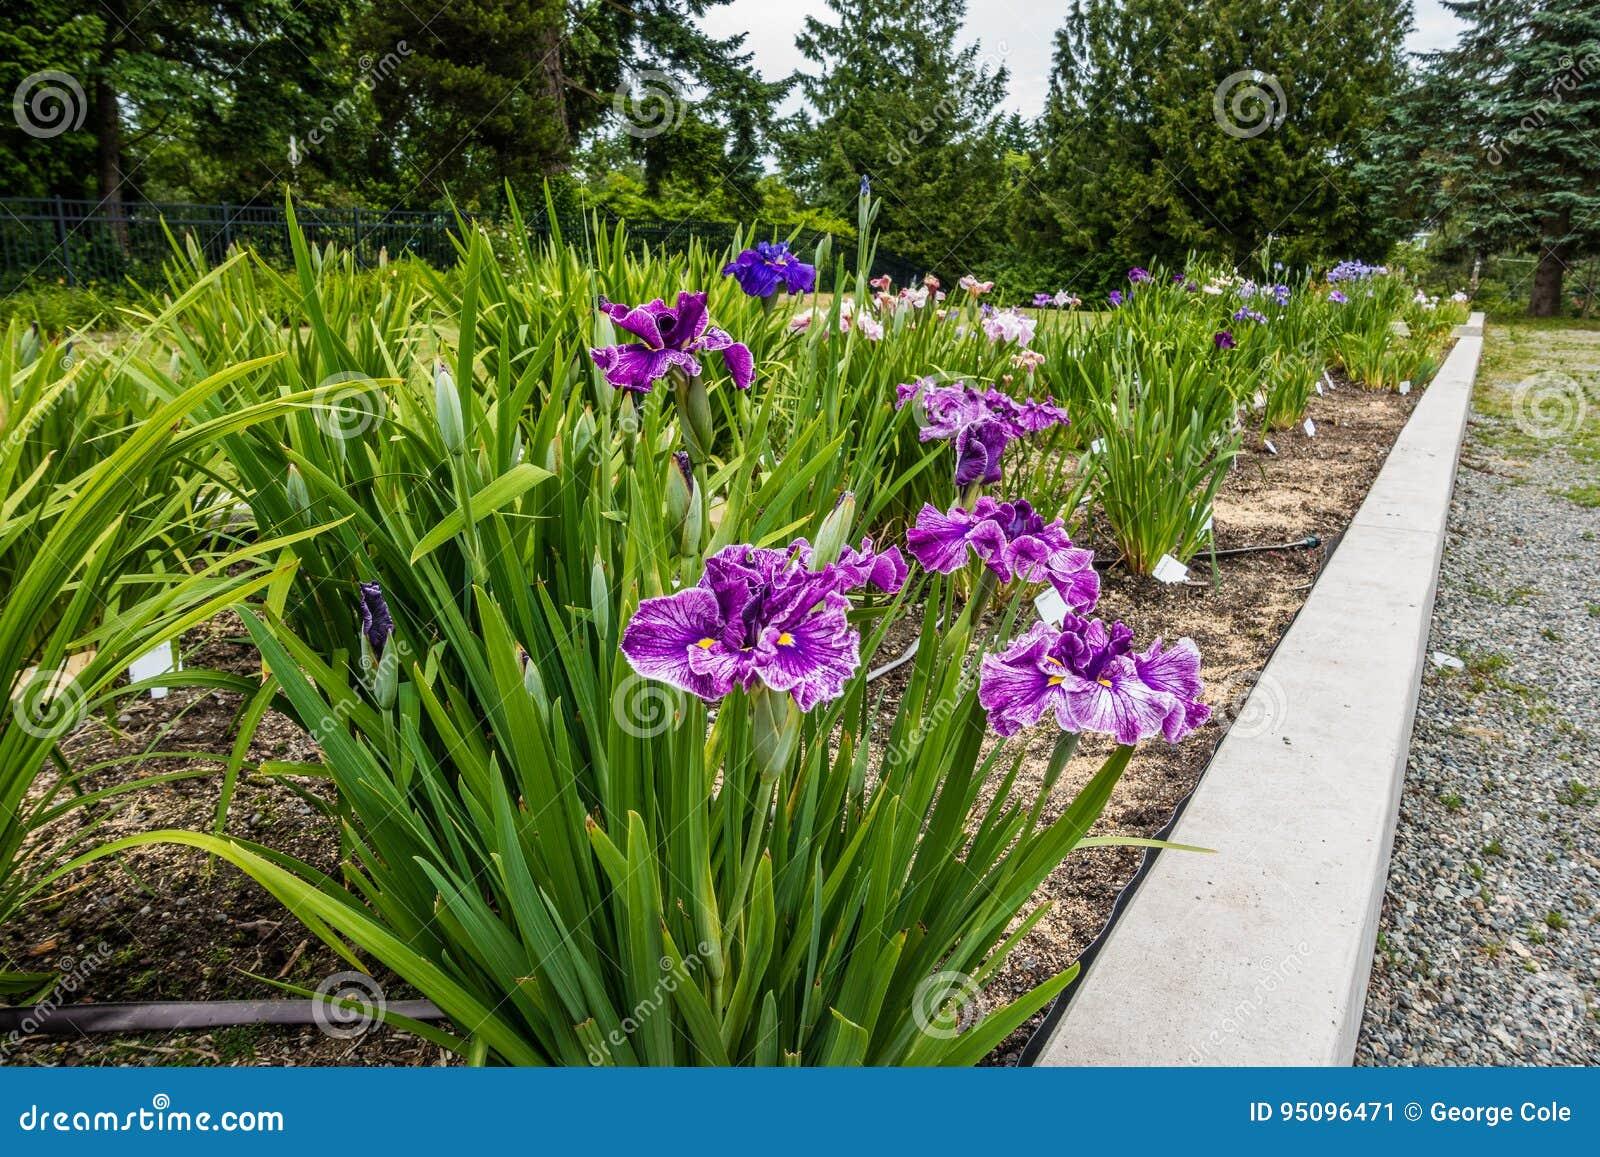 Iris flower garden stock image image of iris view blossming download iris flower garden stock image image of iris view blossming 95096471 izmirmasajfo